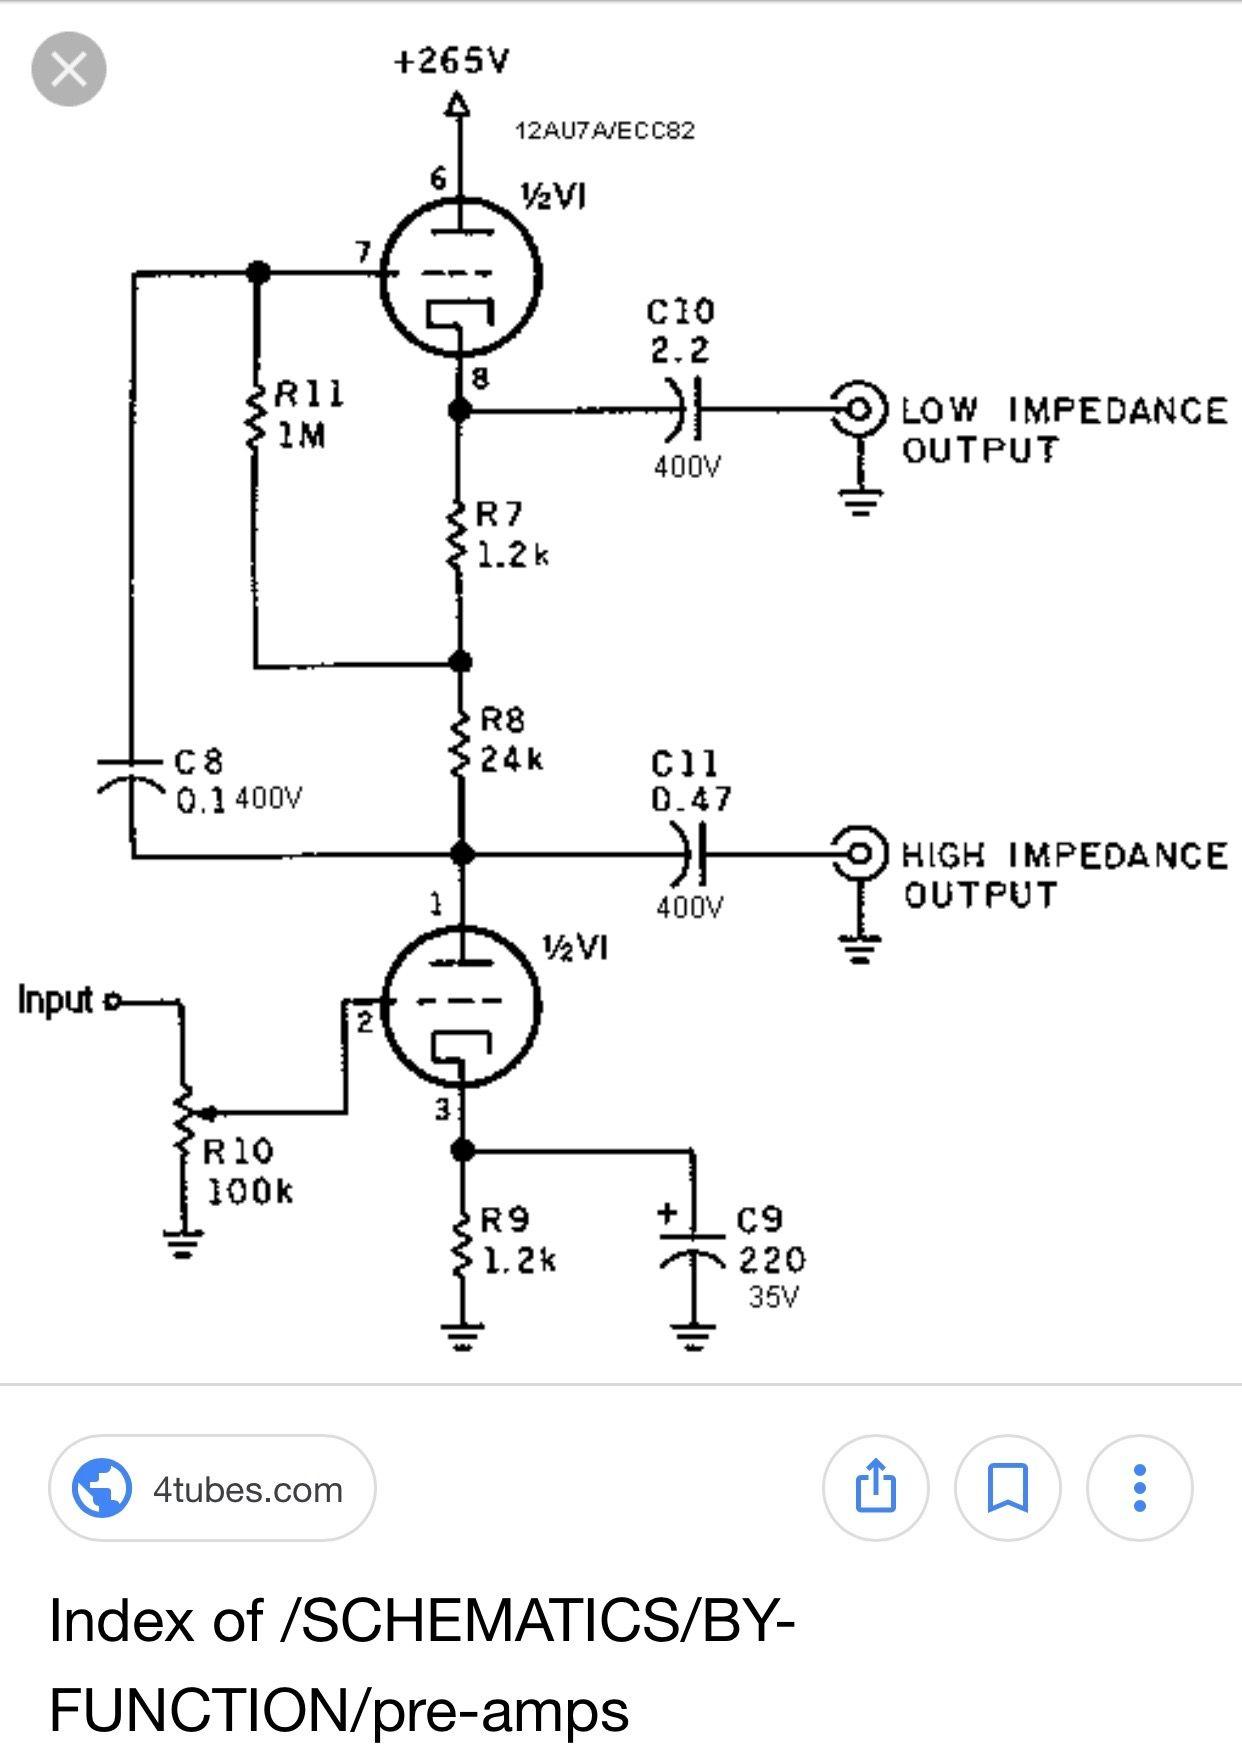 Pin By Veld On 614 In 2018 Pinterest Electronic Vacuum Cleaner Diagram Tube Ham Radio Vacuums Circuit Audio Amp Wet